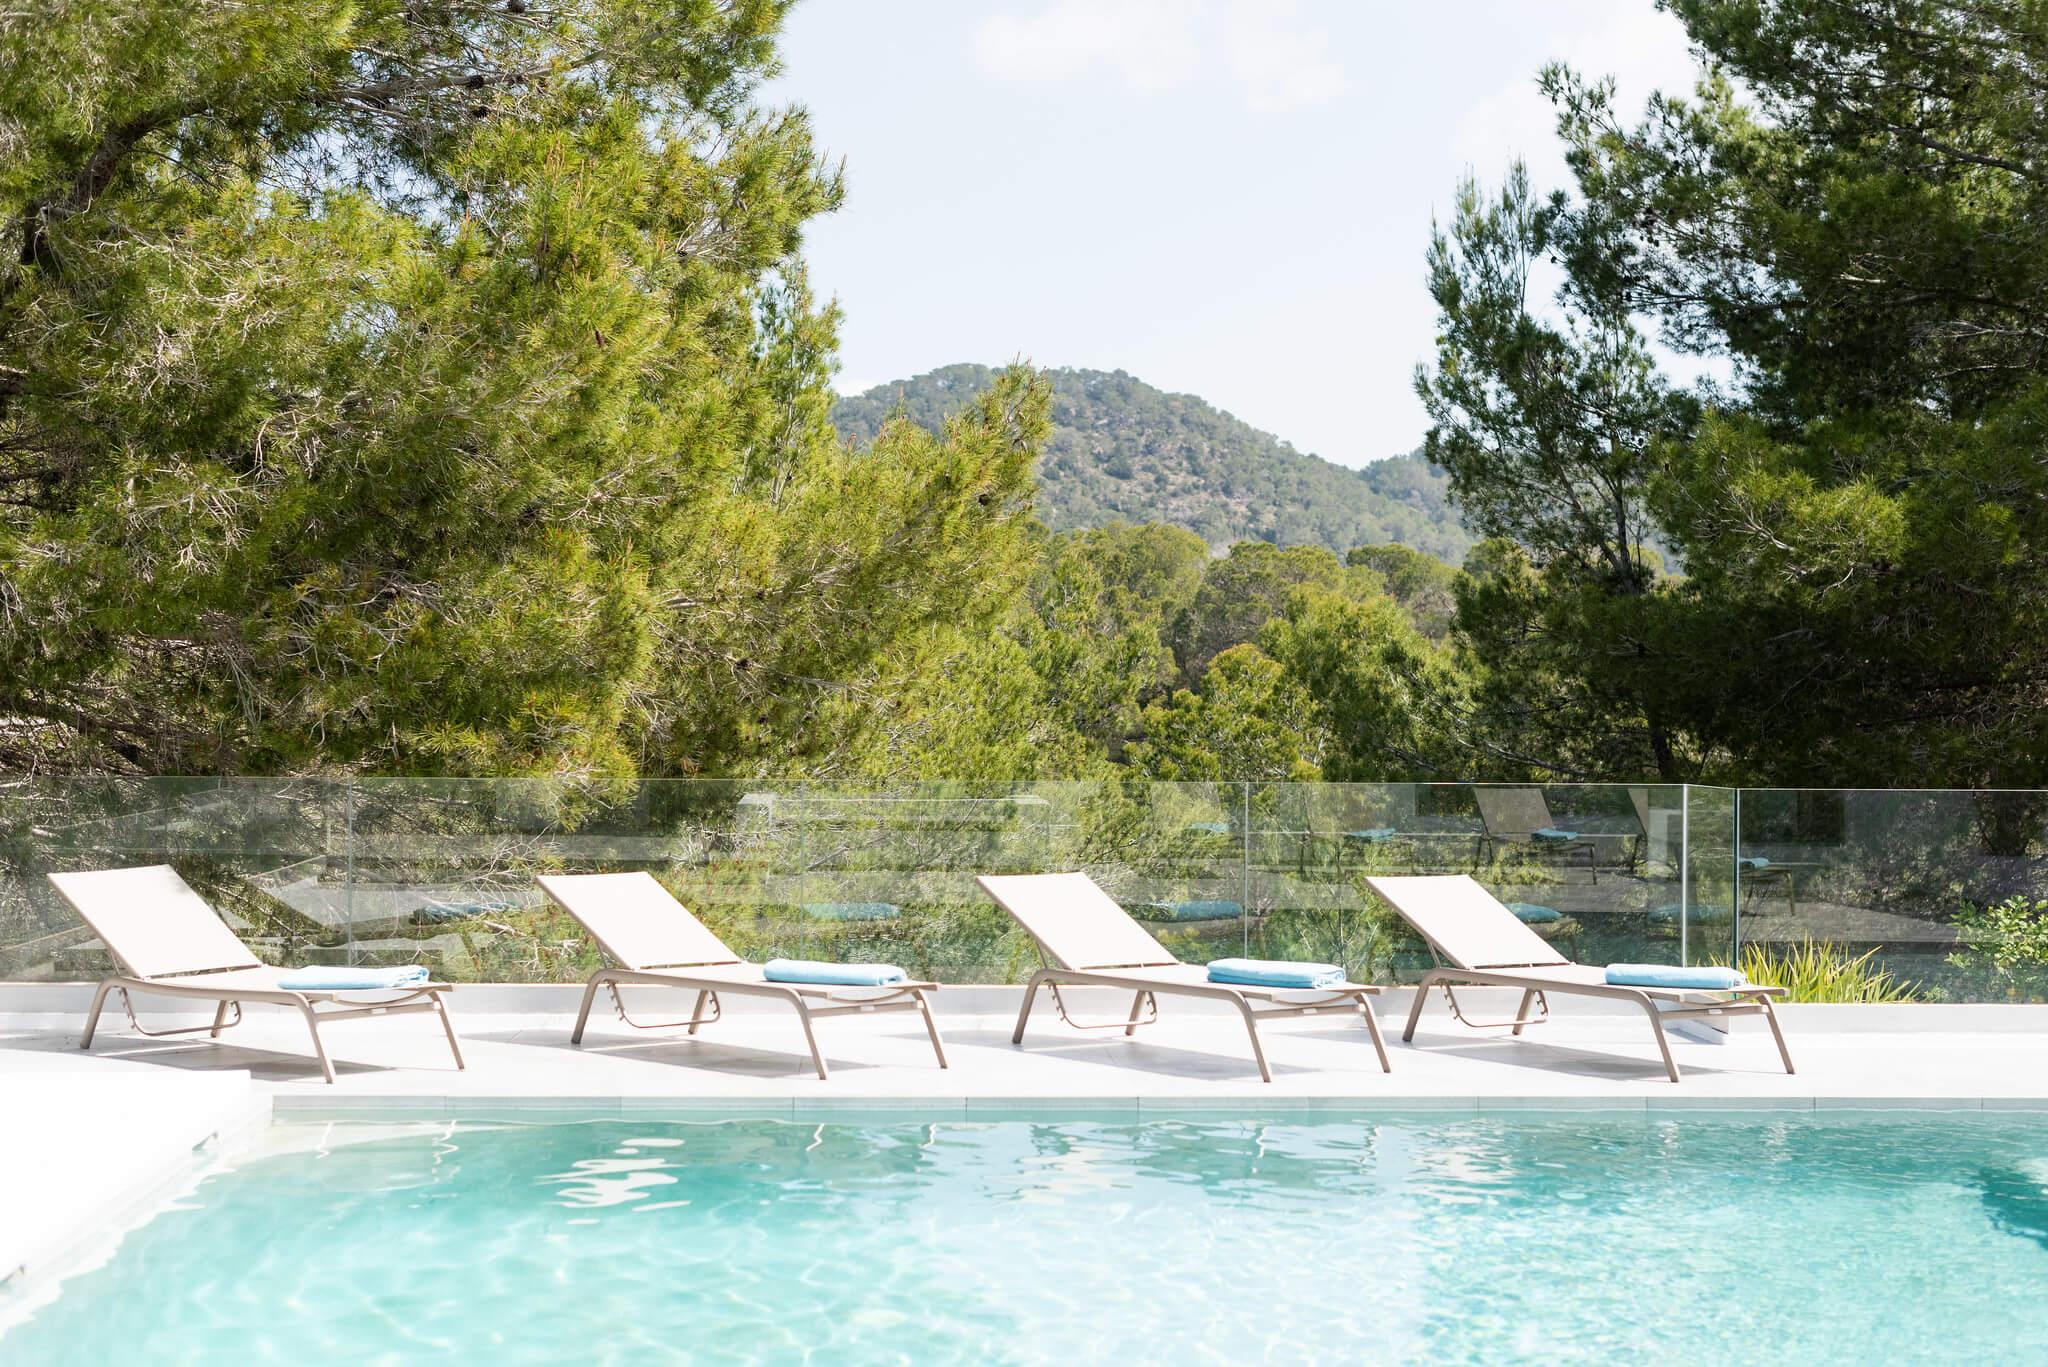 https://www.white-ibiza.com/wp-content/uploads/2020/05/white-ibiza-villas-can-dela-loungers.jpg